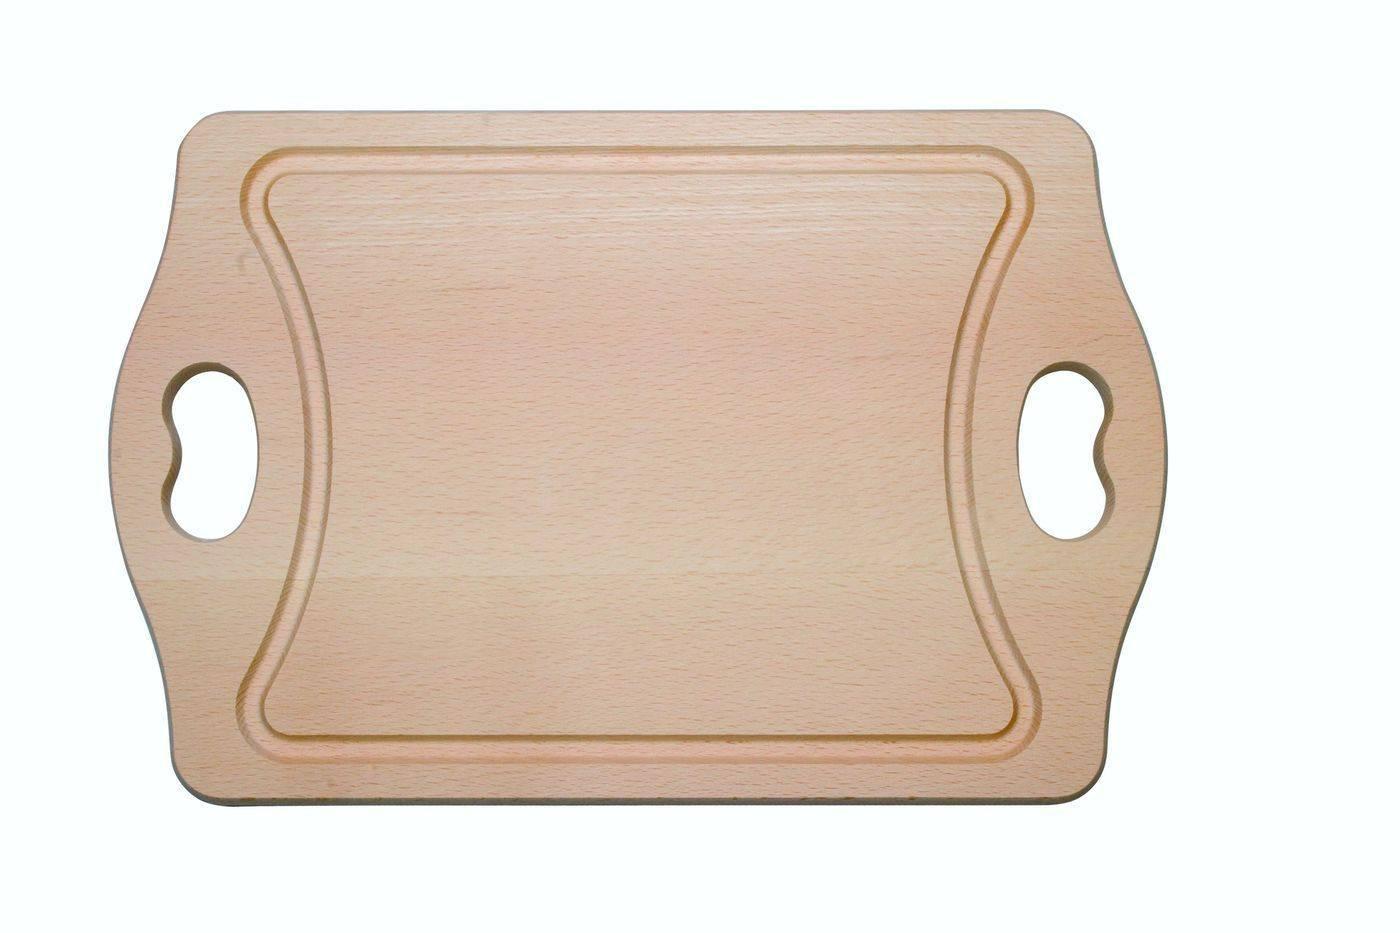 Deska na maso s dvěma úchyty, s drážkou, 400 x 260 x 20 mm - Dřevovýroba Otradov